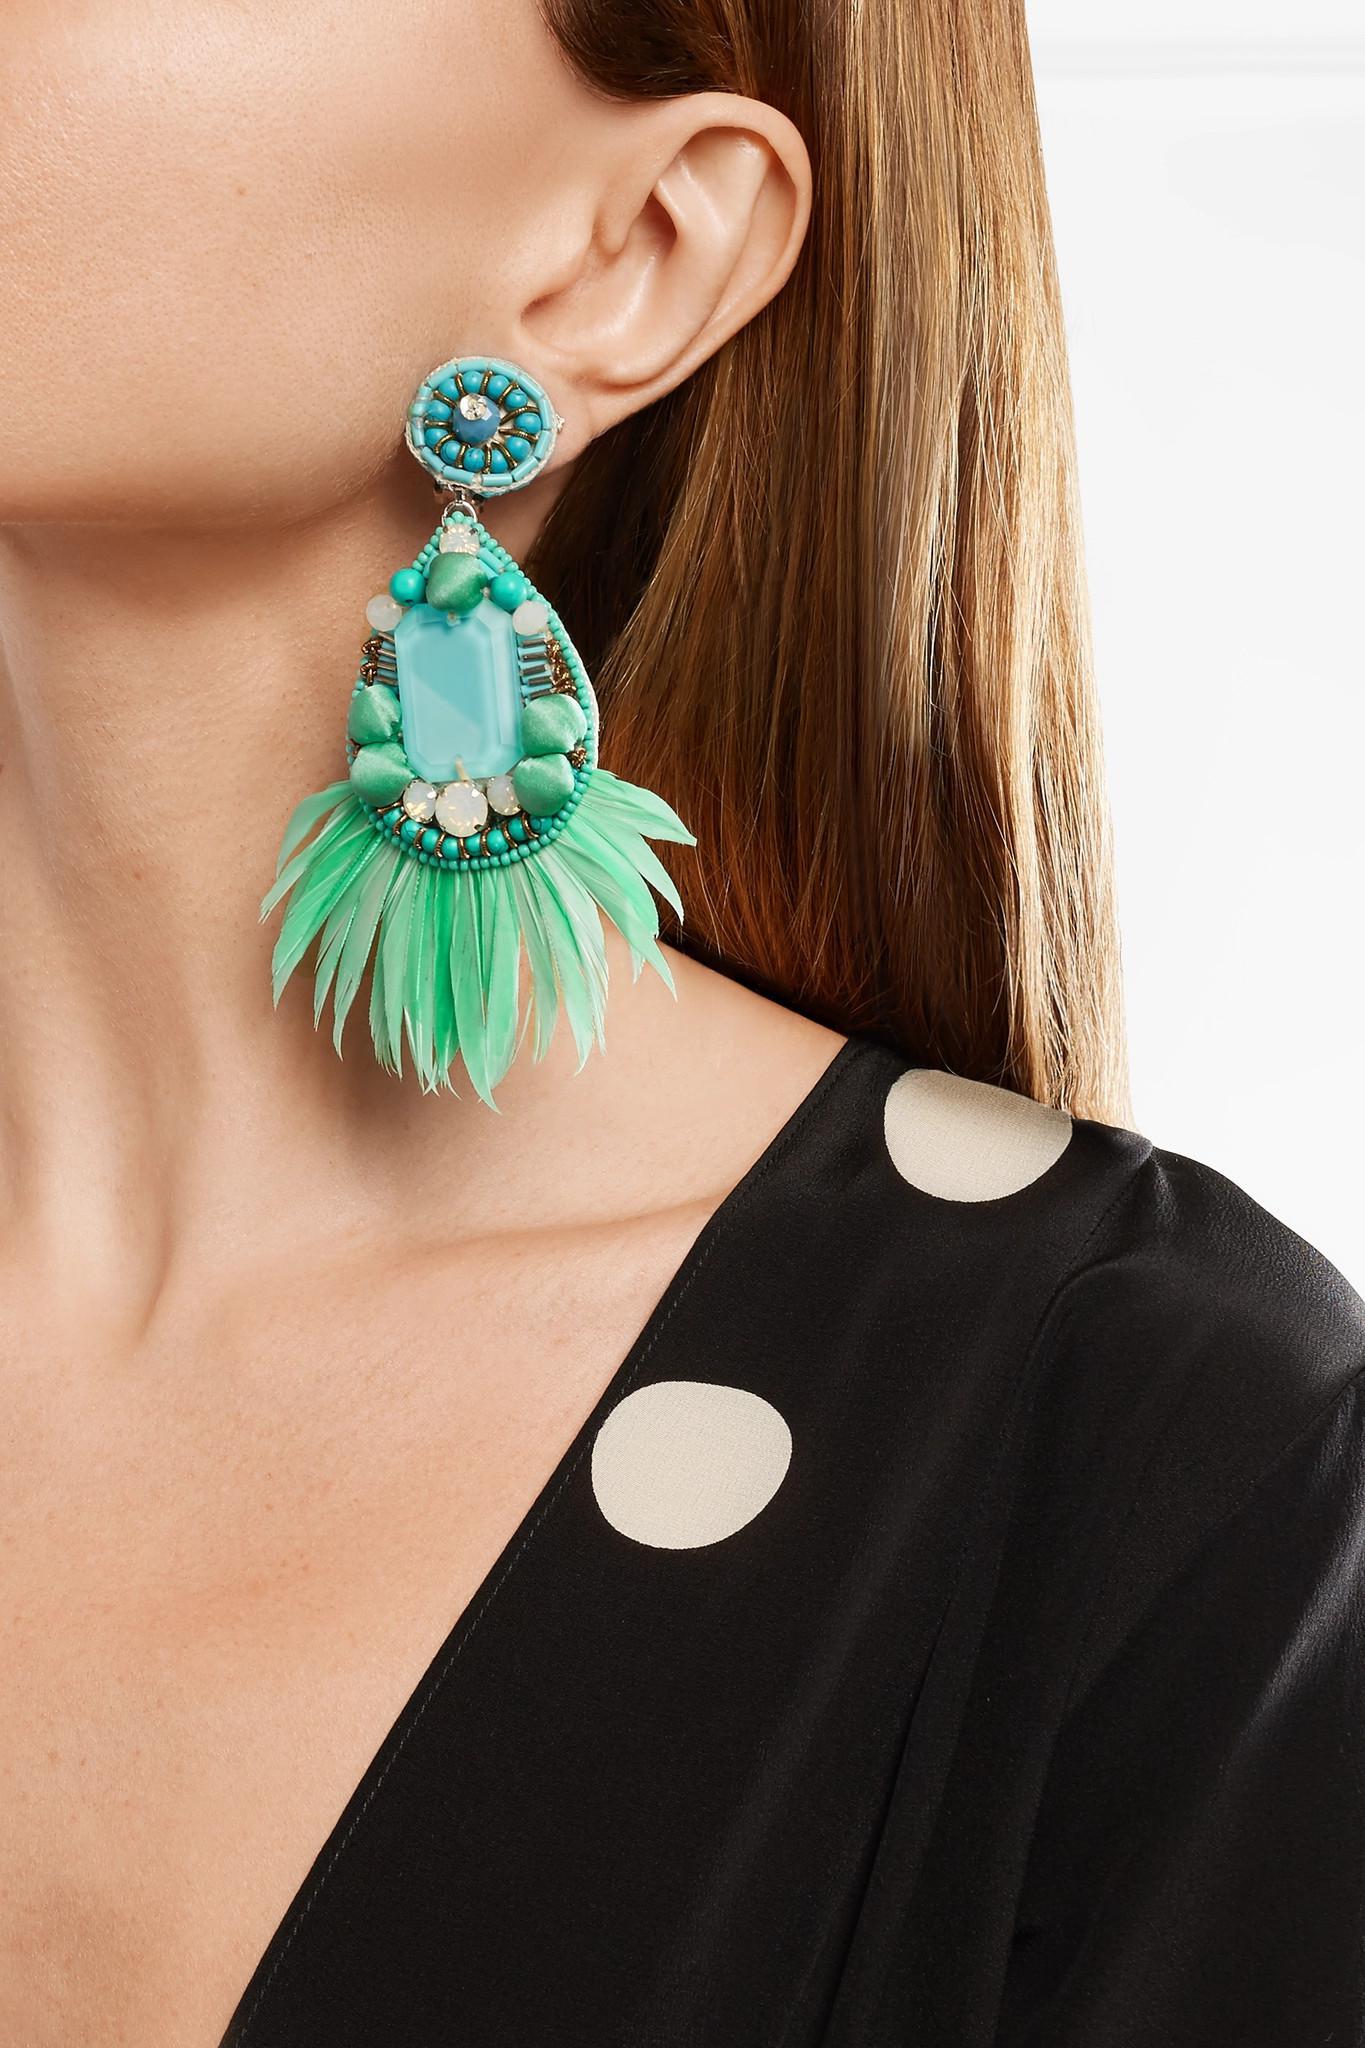 Ranjana Khan Jae Feather And Crystal Clip Earrings - Mint l5T7W